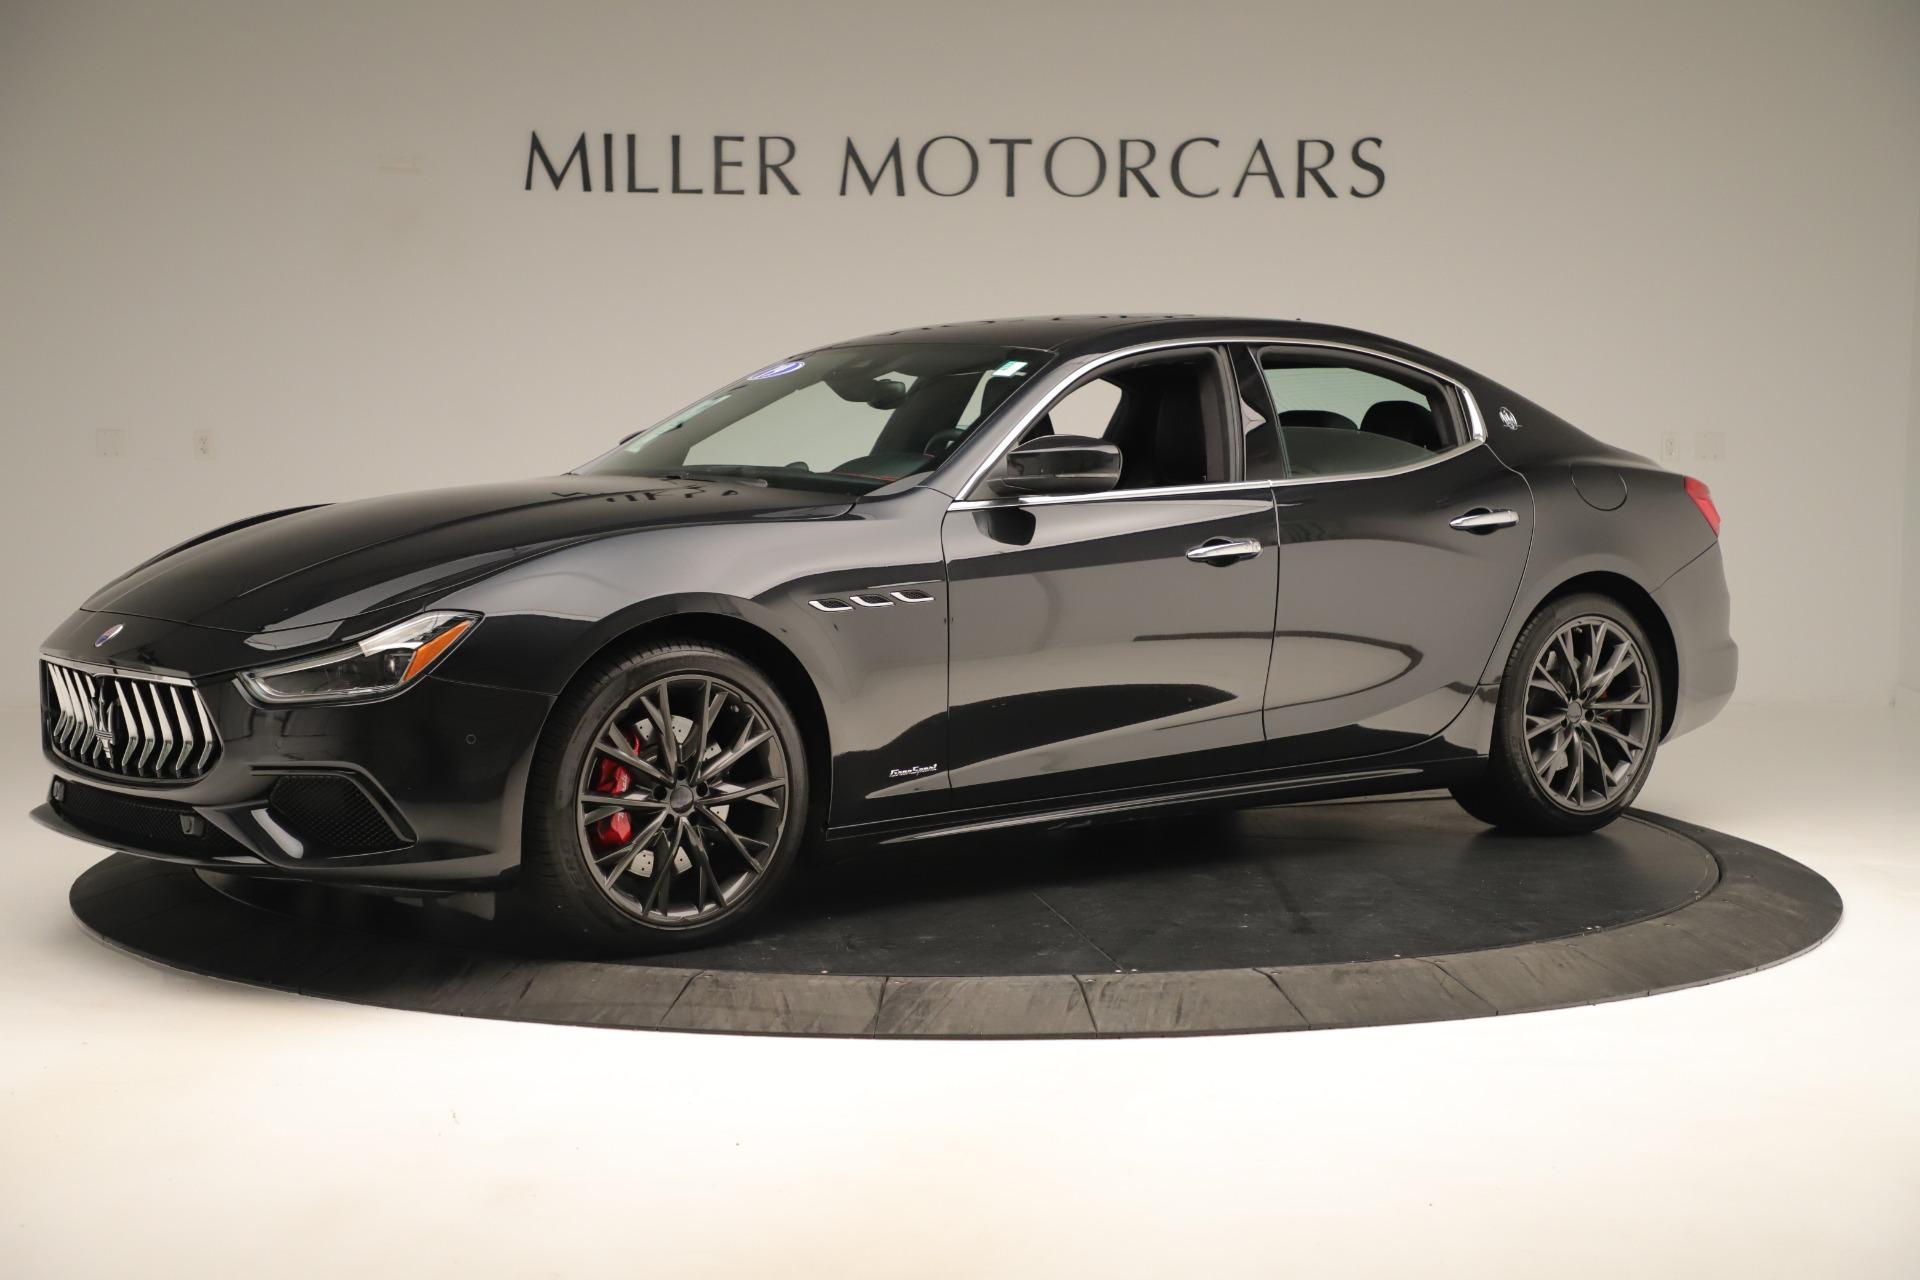 New 2019 Maserati Ghibli S Q4 GranSport For Sale In Greenwich, CT. Alfa Romeo of Greenwich, M2204 2640_p2